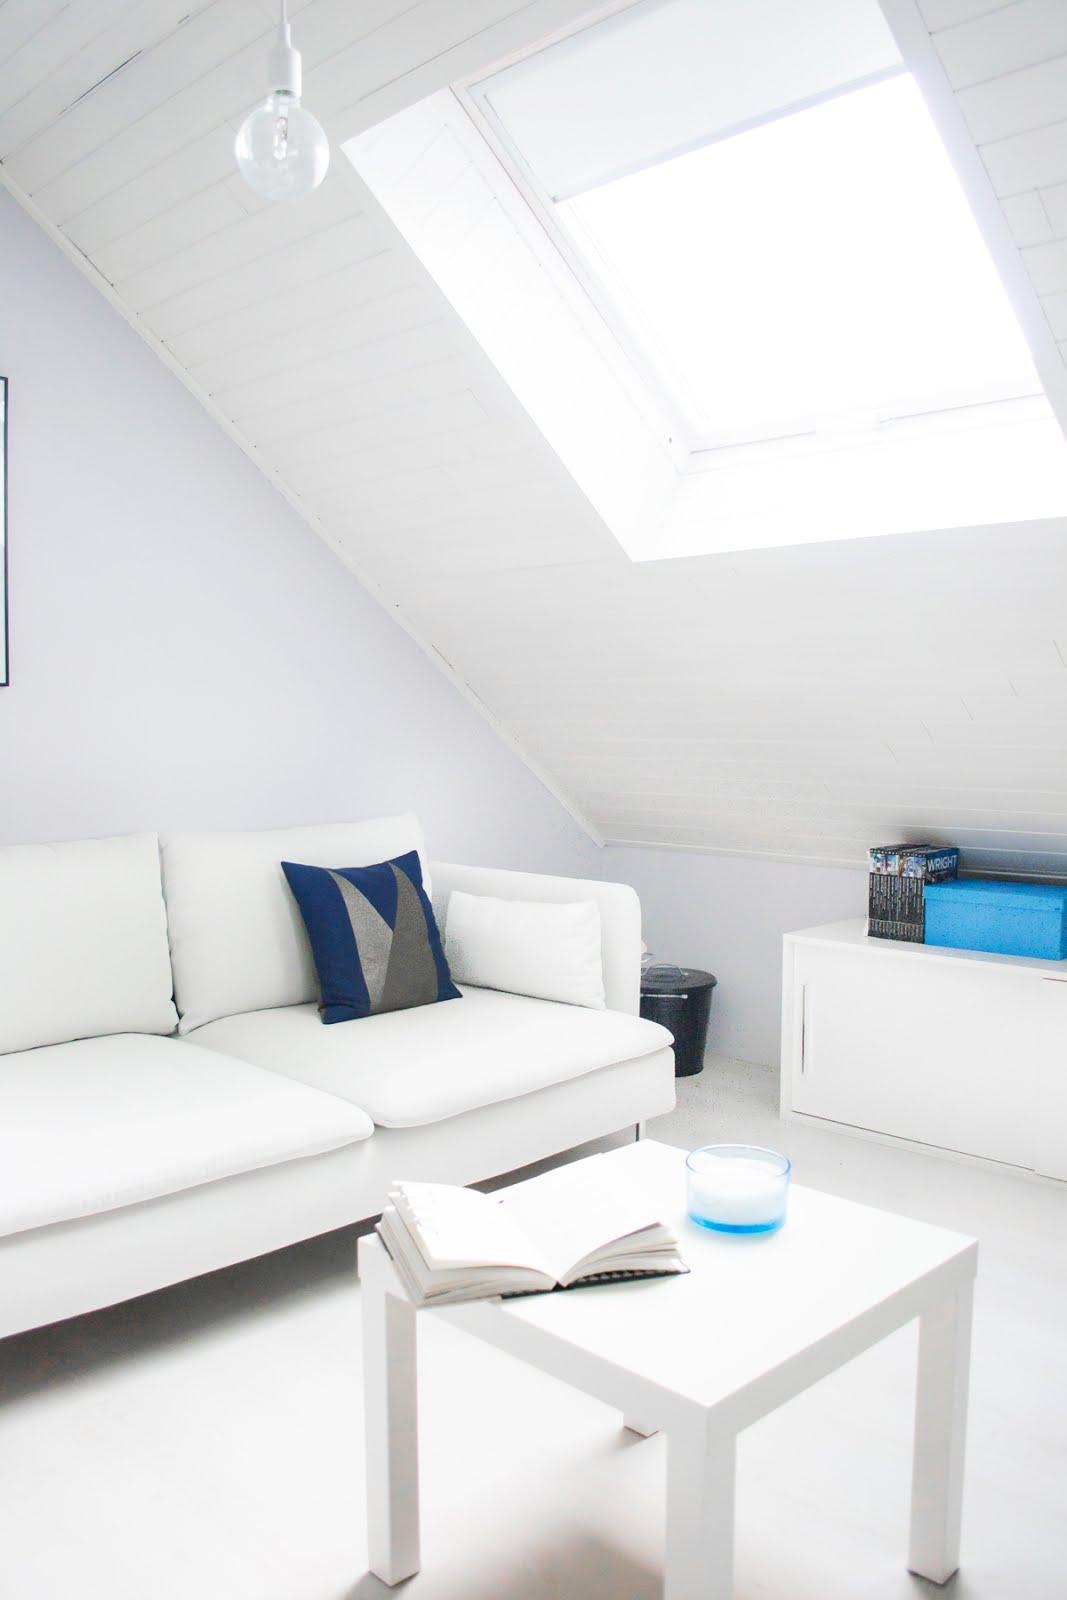 Ikea soderhamn sofa, maison popineau, ikea lack, white interior, scandinavian, interior design, velux